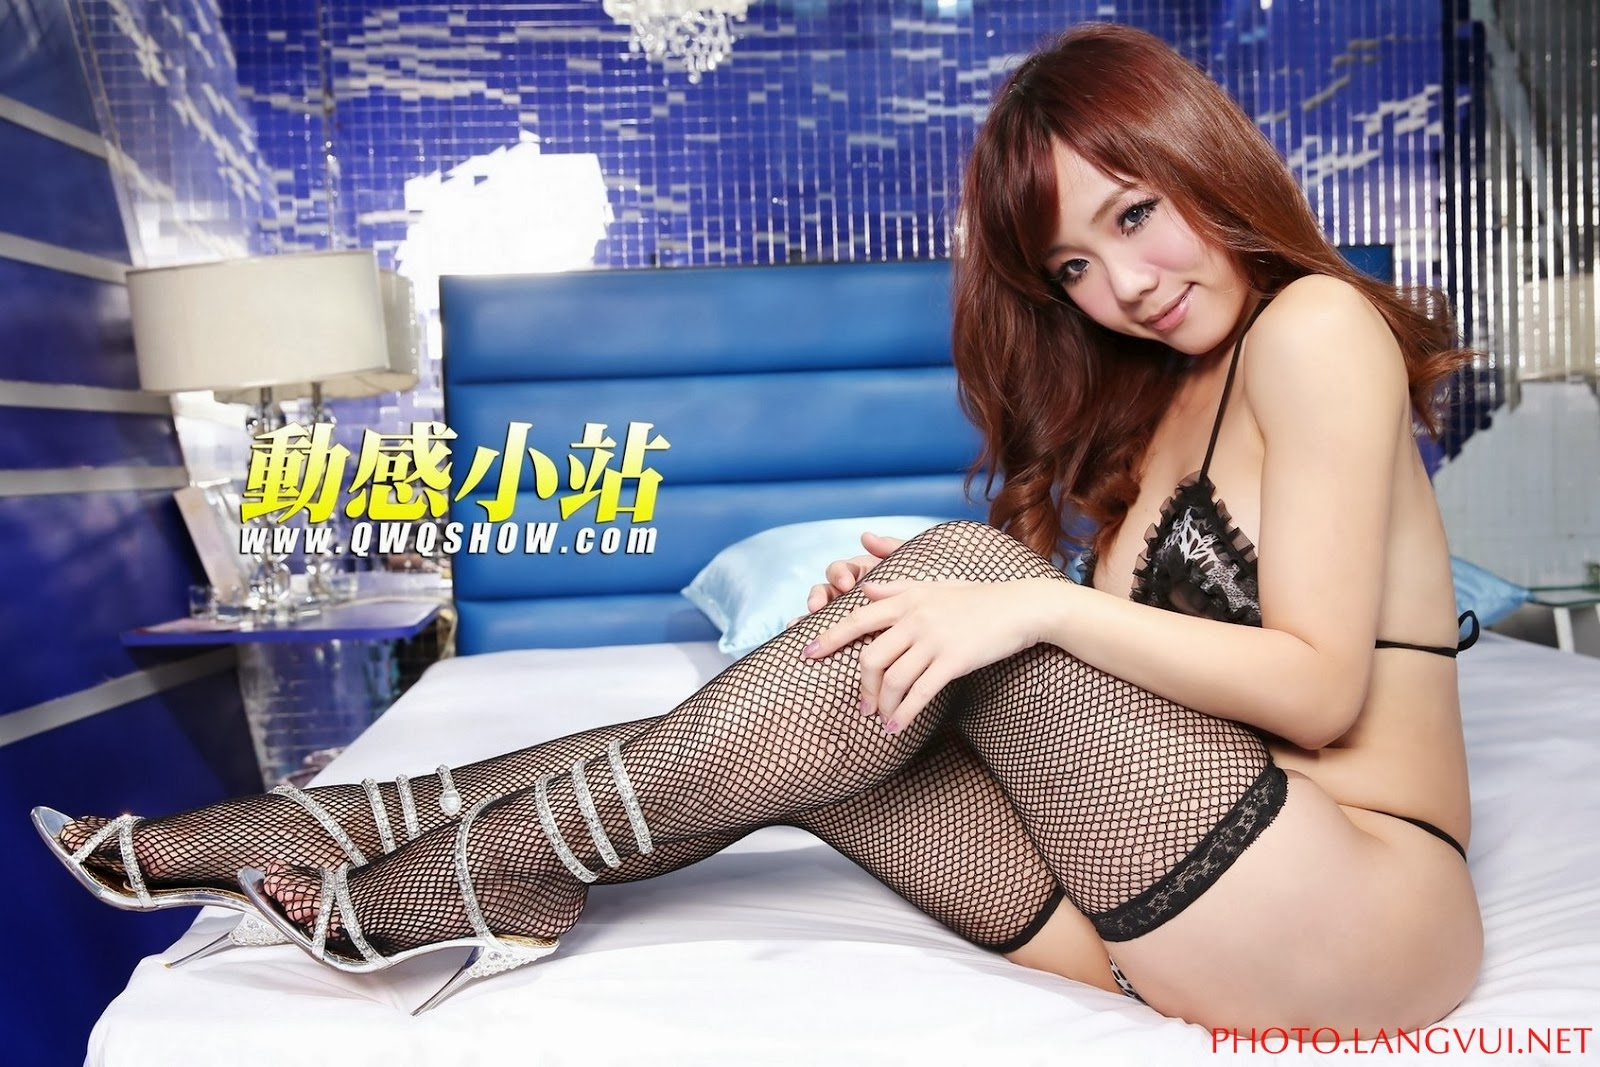 Asian Sexy Phot 76